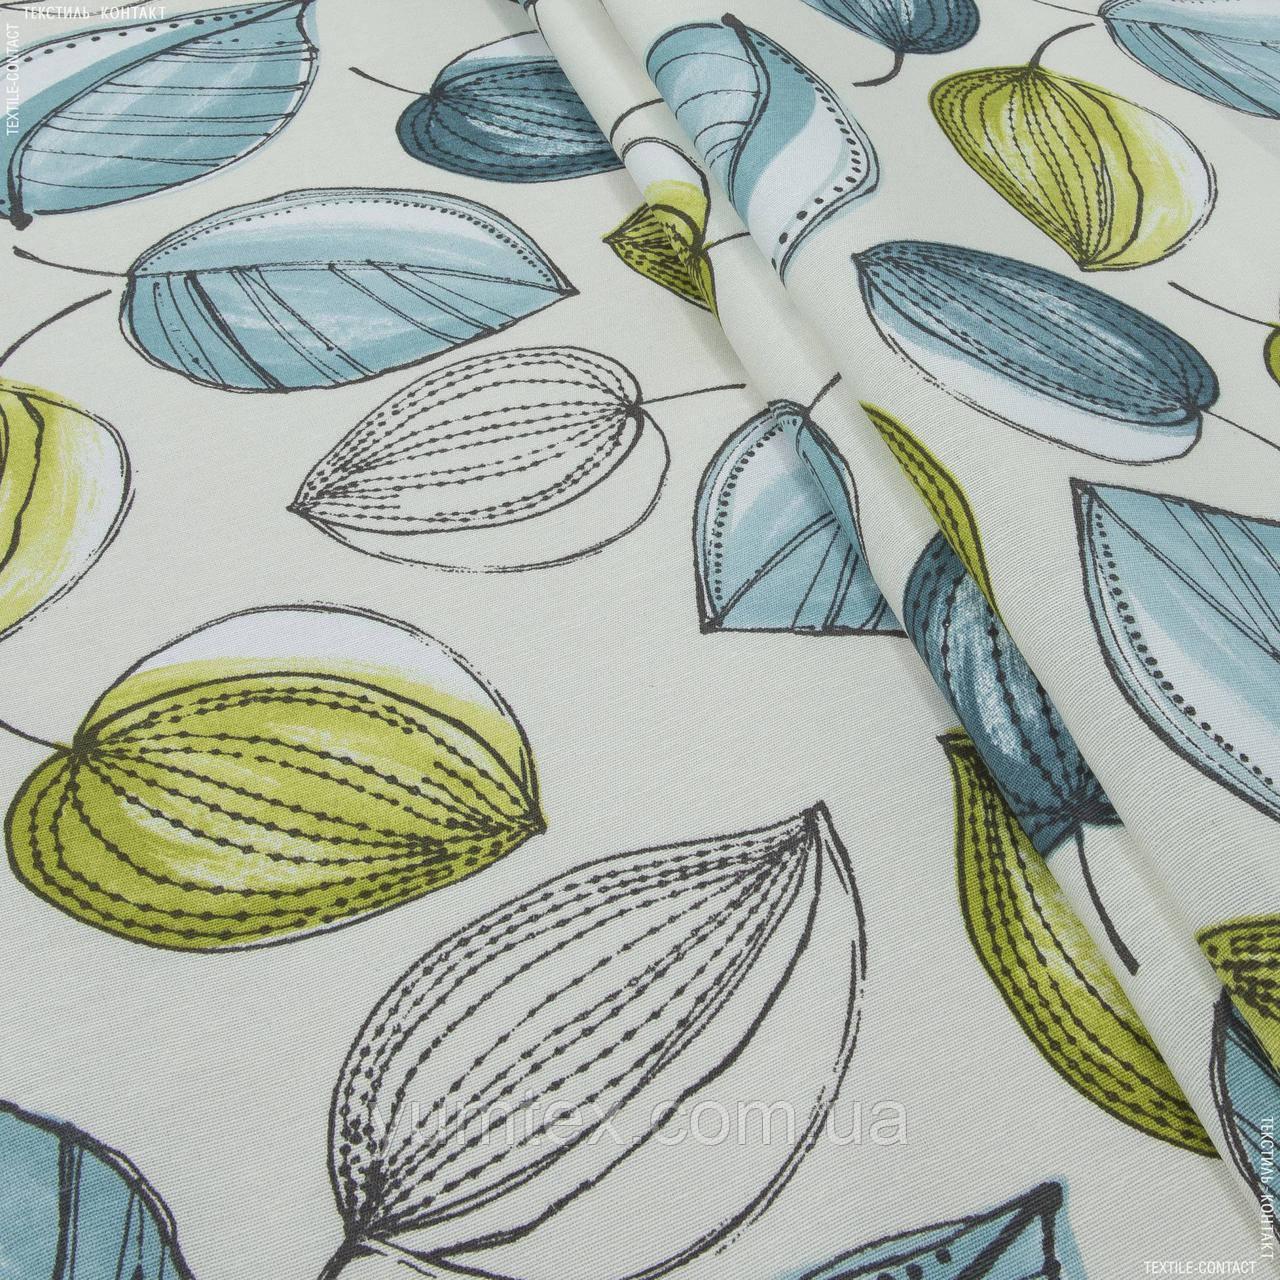 Декоративная ткань  кастано/castano 134336